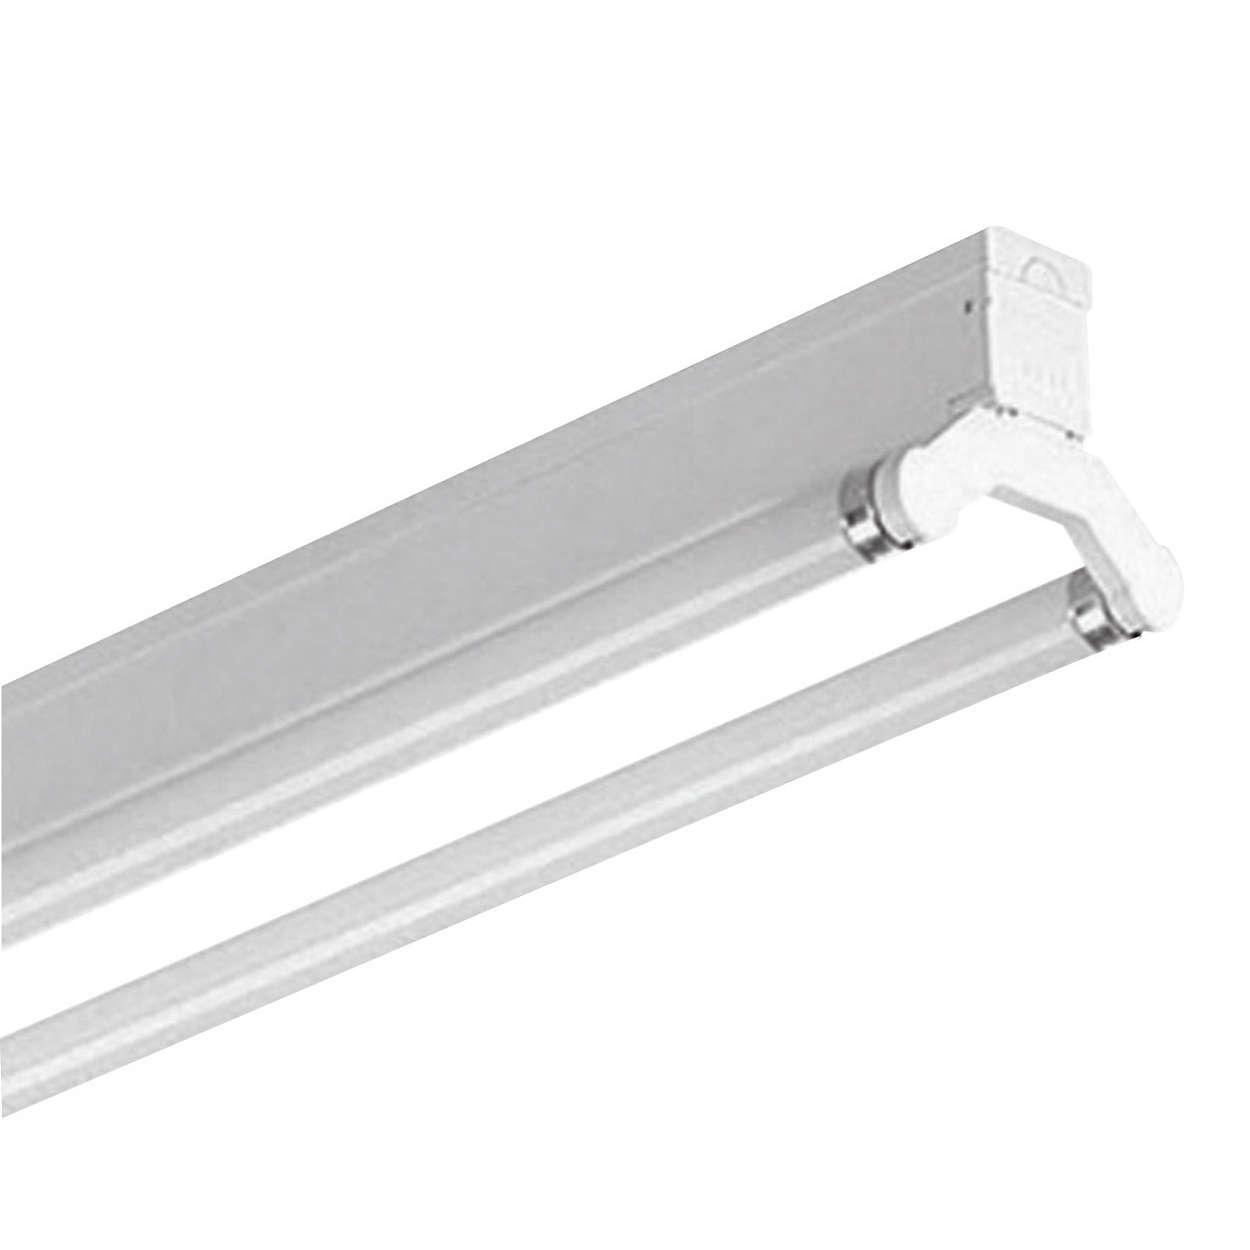 TMX204 LS – slender and versatile